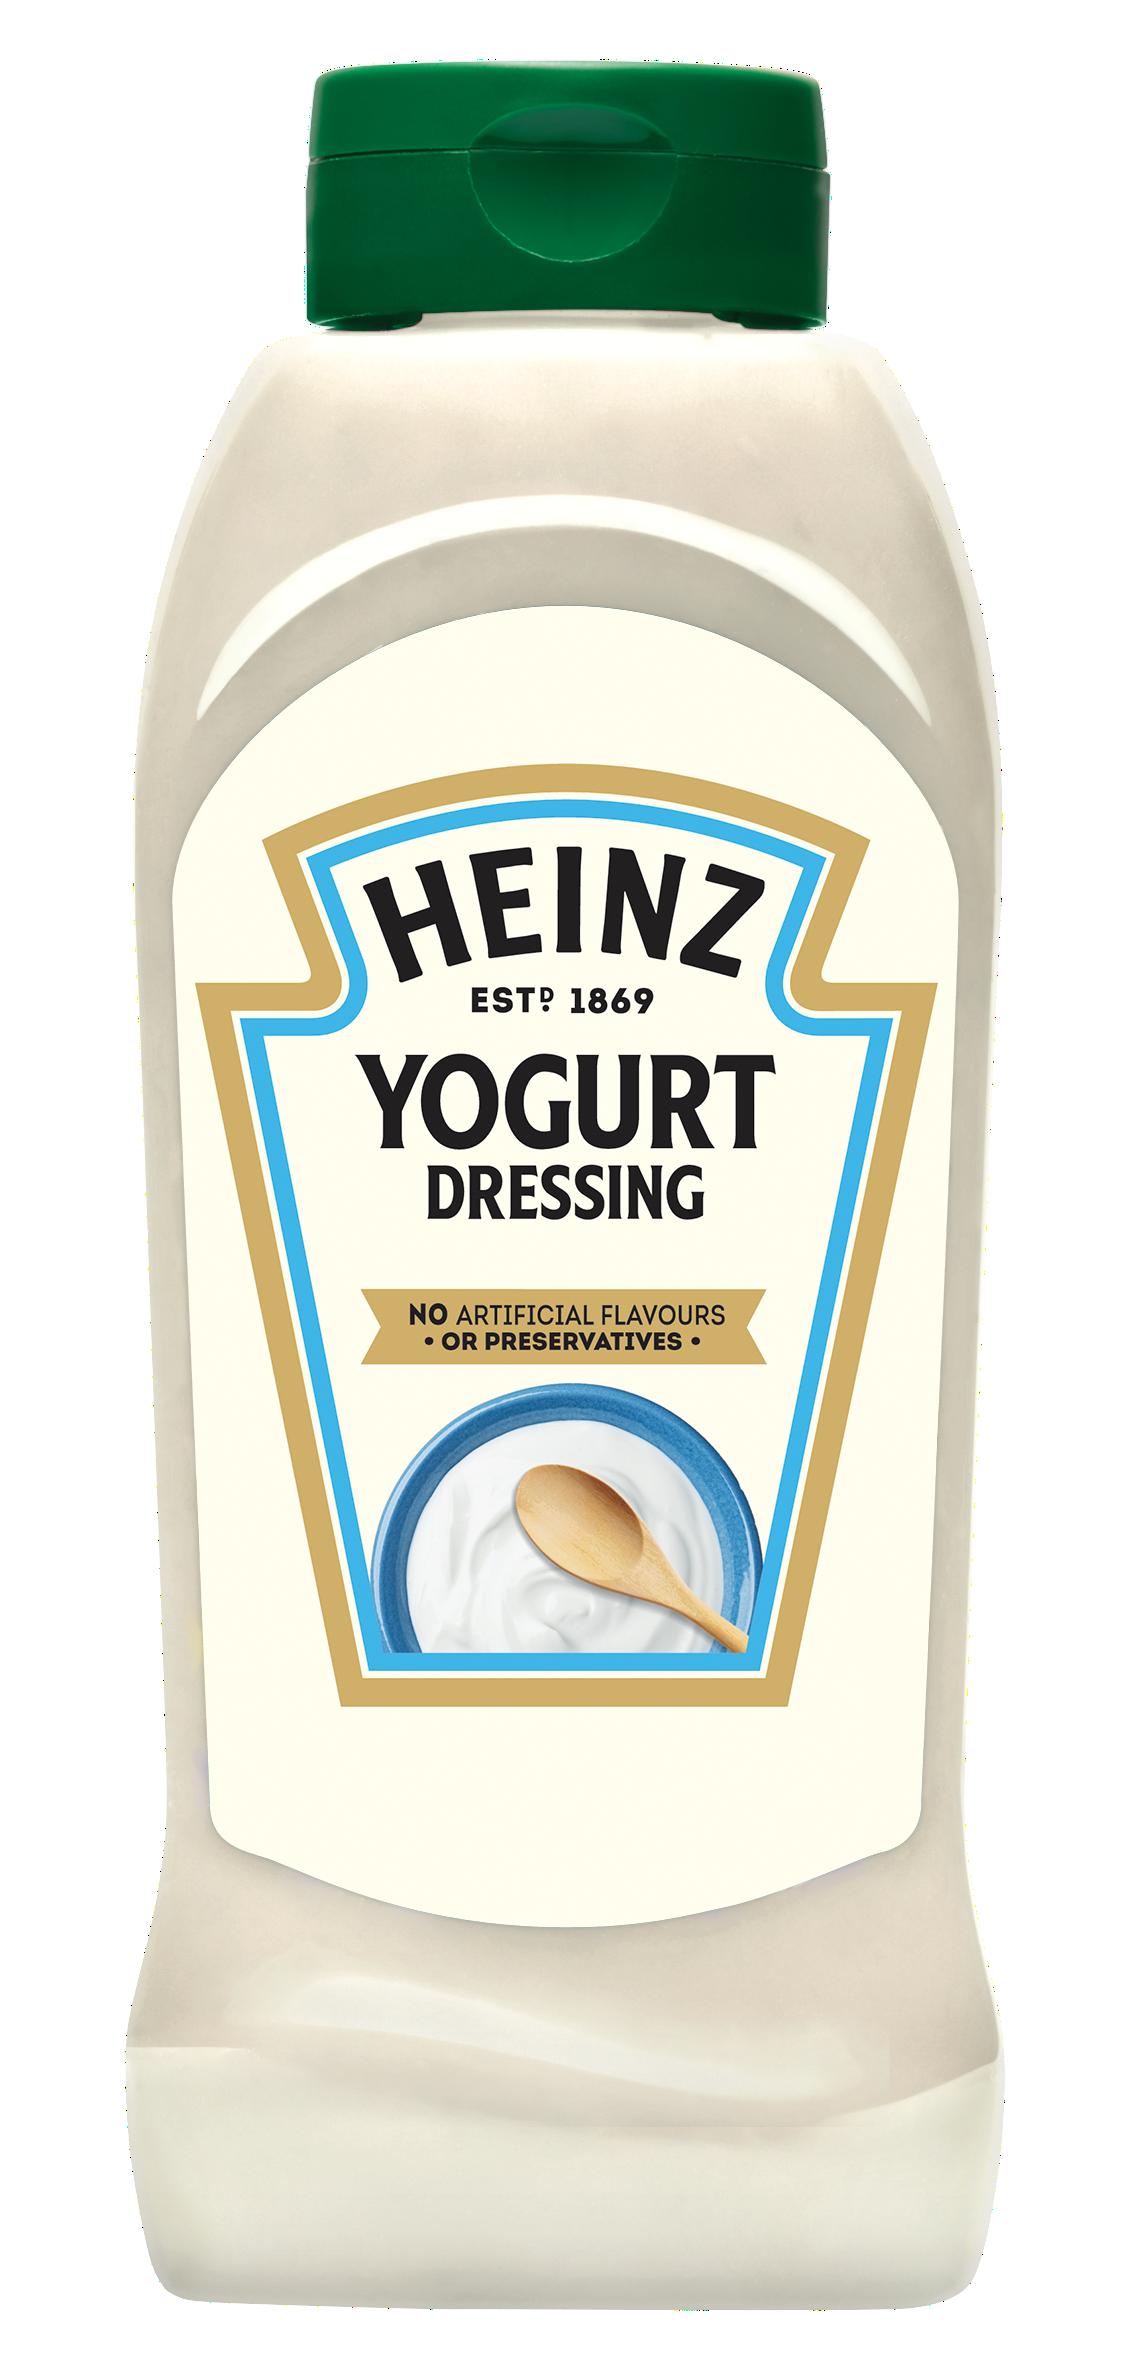 Heinz Yoghurt Dressing 800ml Up Right image